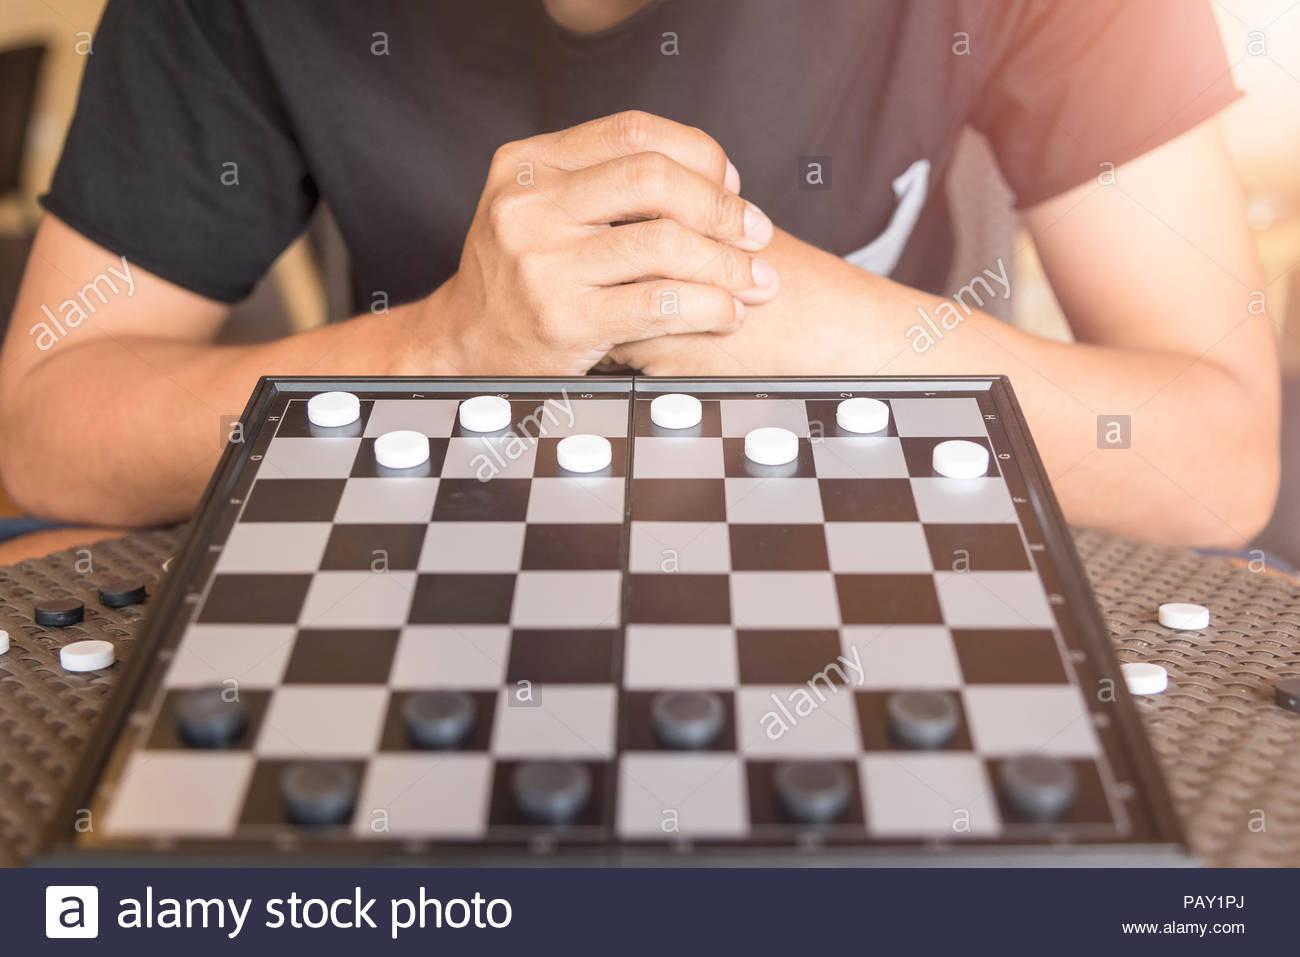 Strategic Planning, Man wear black shirt playing checkers game Stock Photo